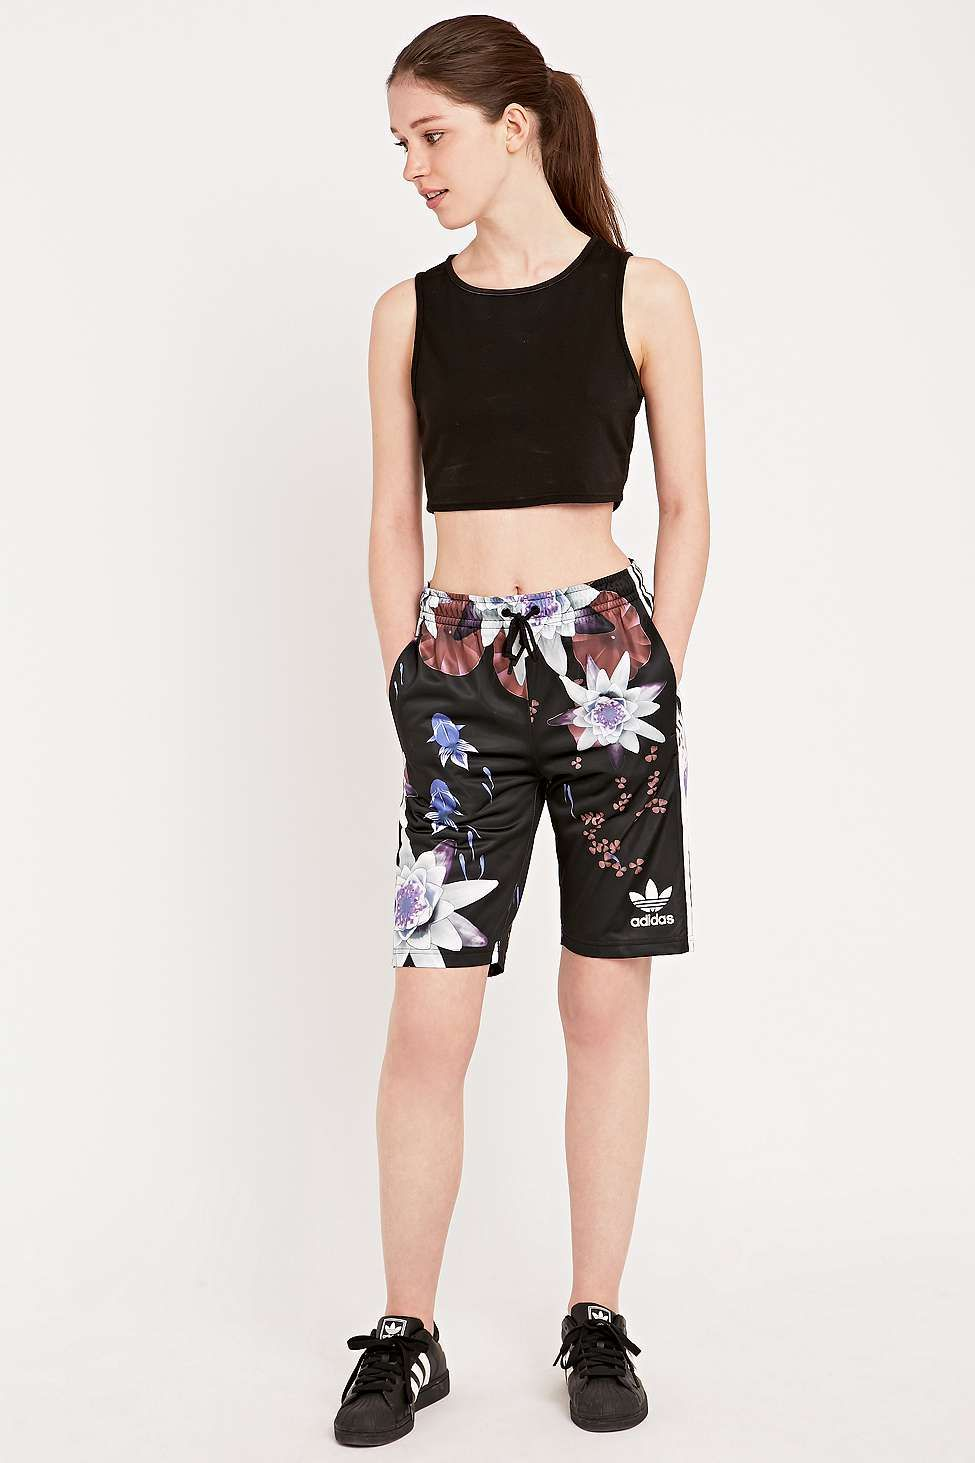 06db3e20ce3 adidas Originals Lotus Print Basketball Shorts in Black